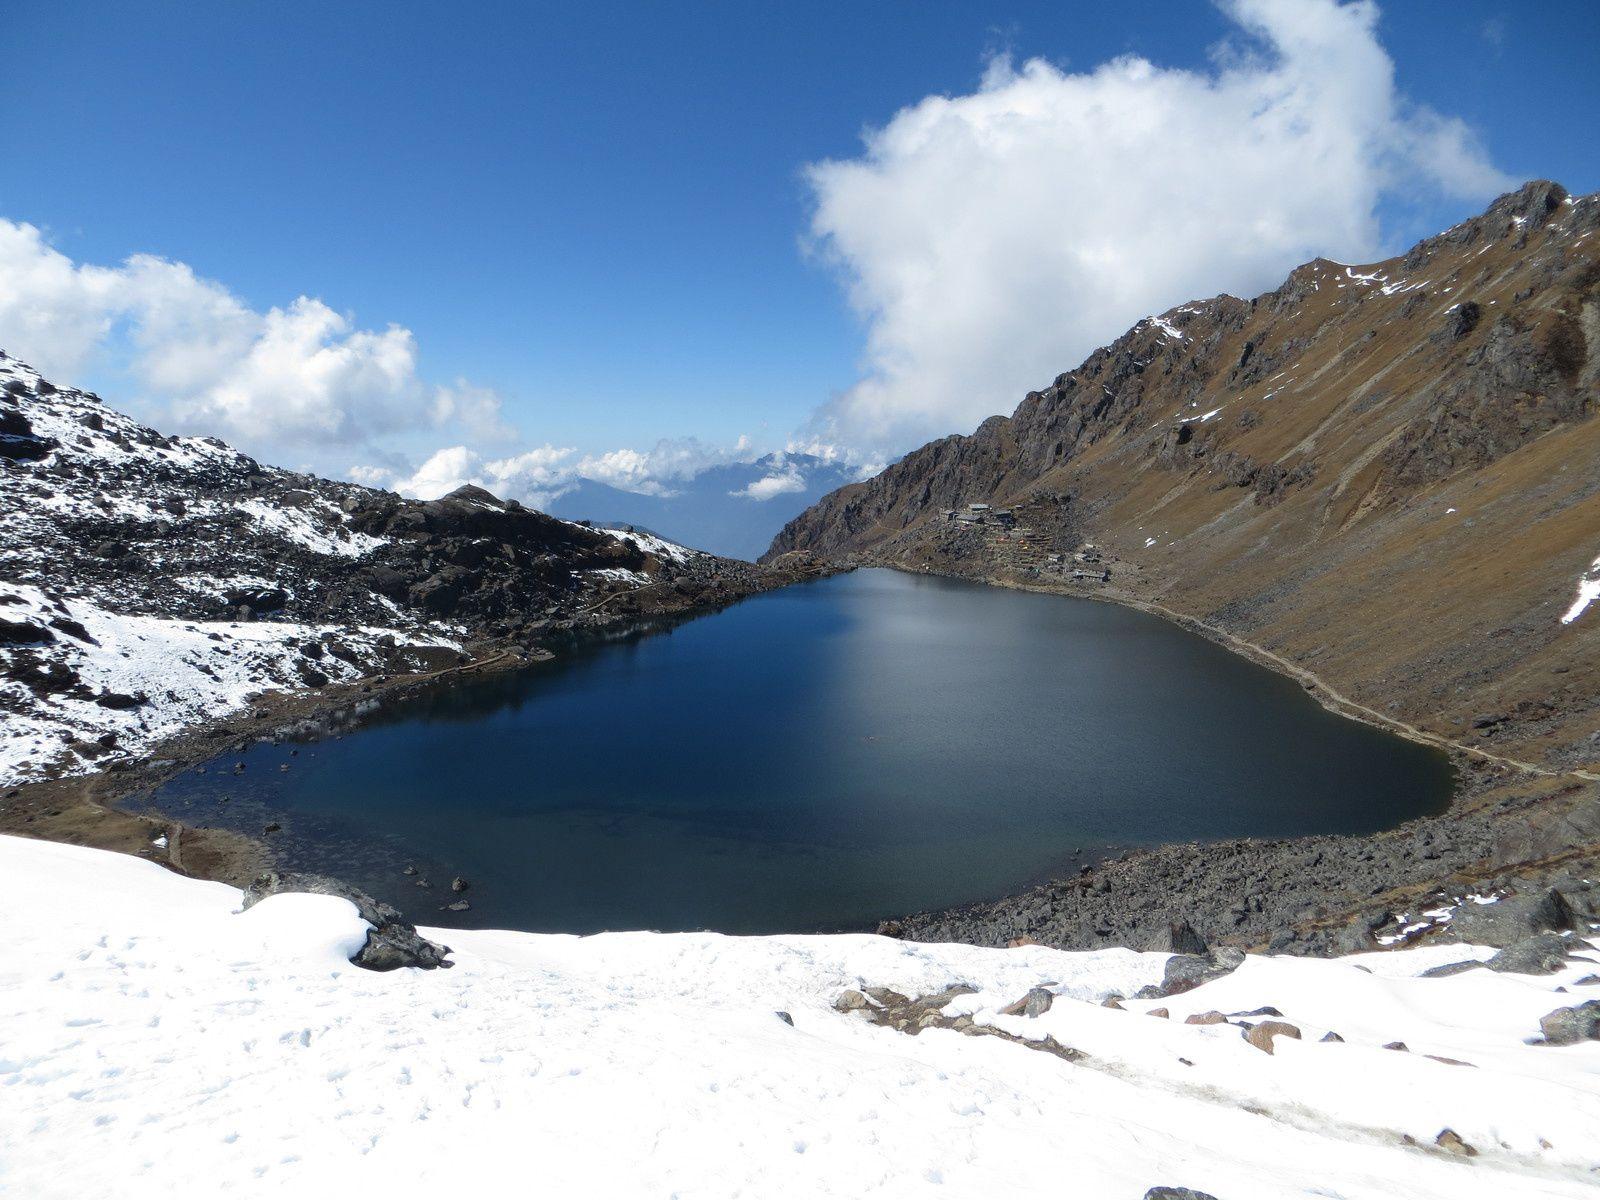 Shin Gumba, Gosain Kund, passage au Laurebina Pass (4610m), à côté du lac Surya Kund